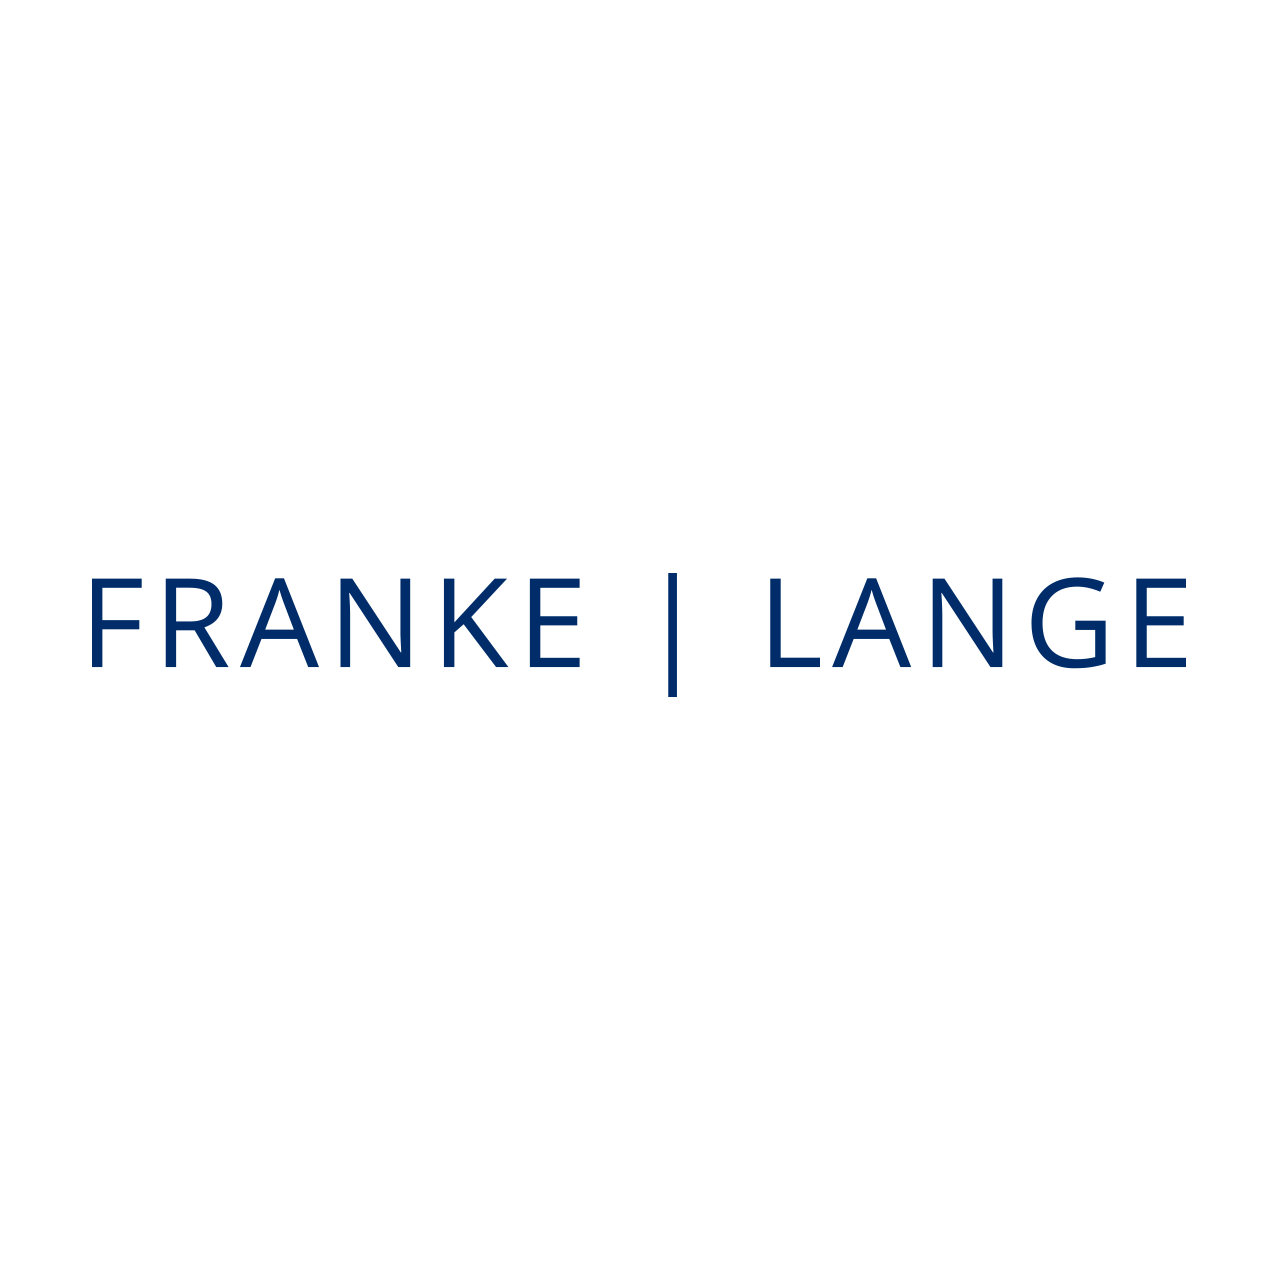 Kanzleimarketing Praxismarketing